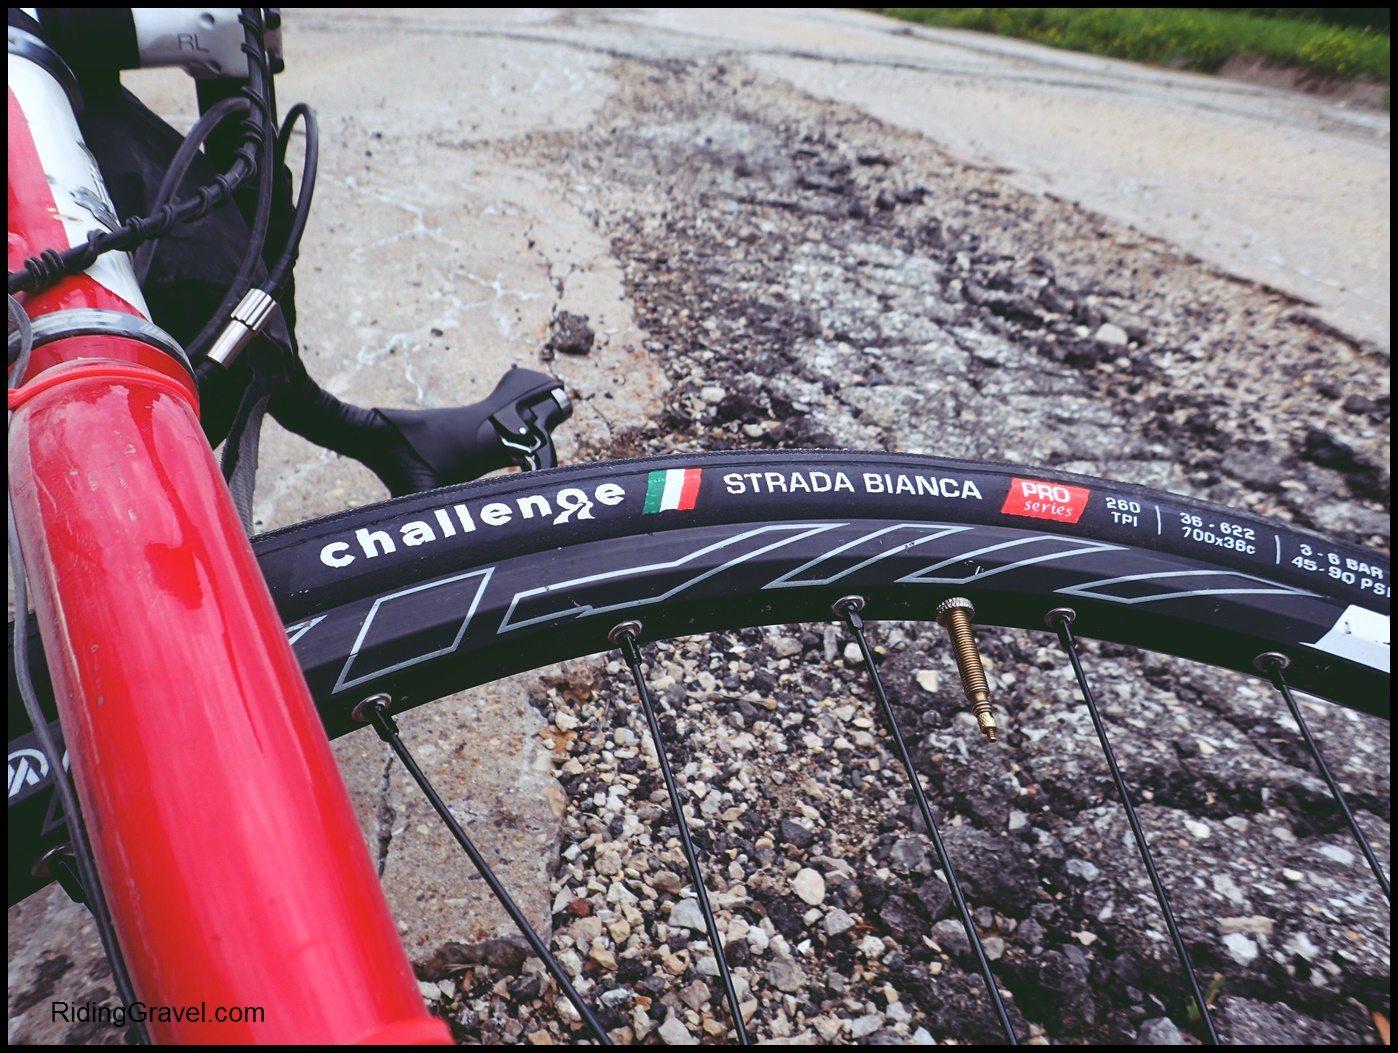 Challenge Tires Strada Bianca 36 Tires: Getting Rolling